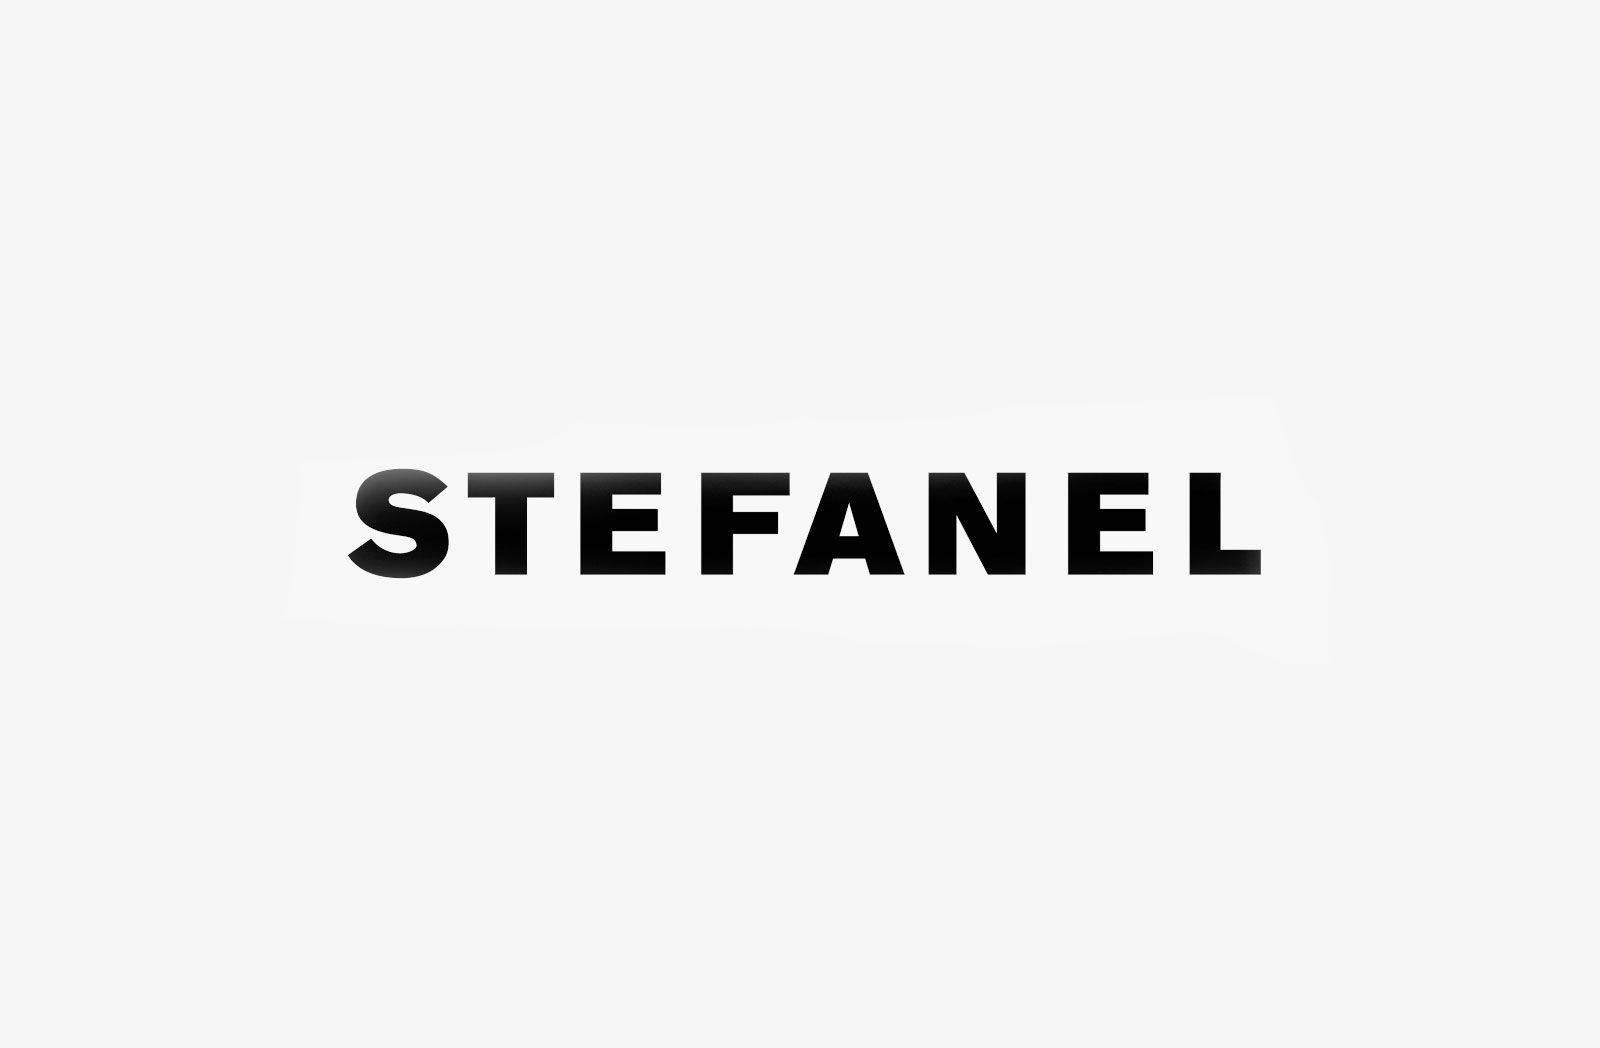 stefanel-logo